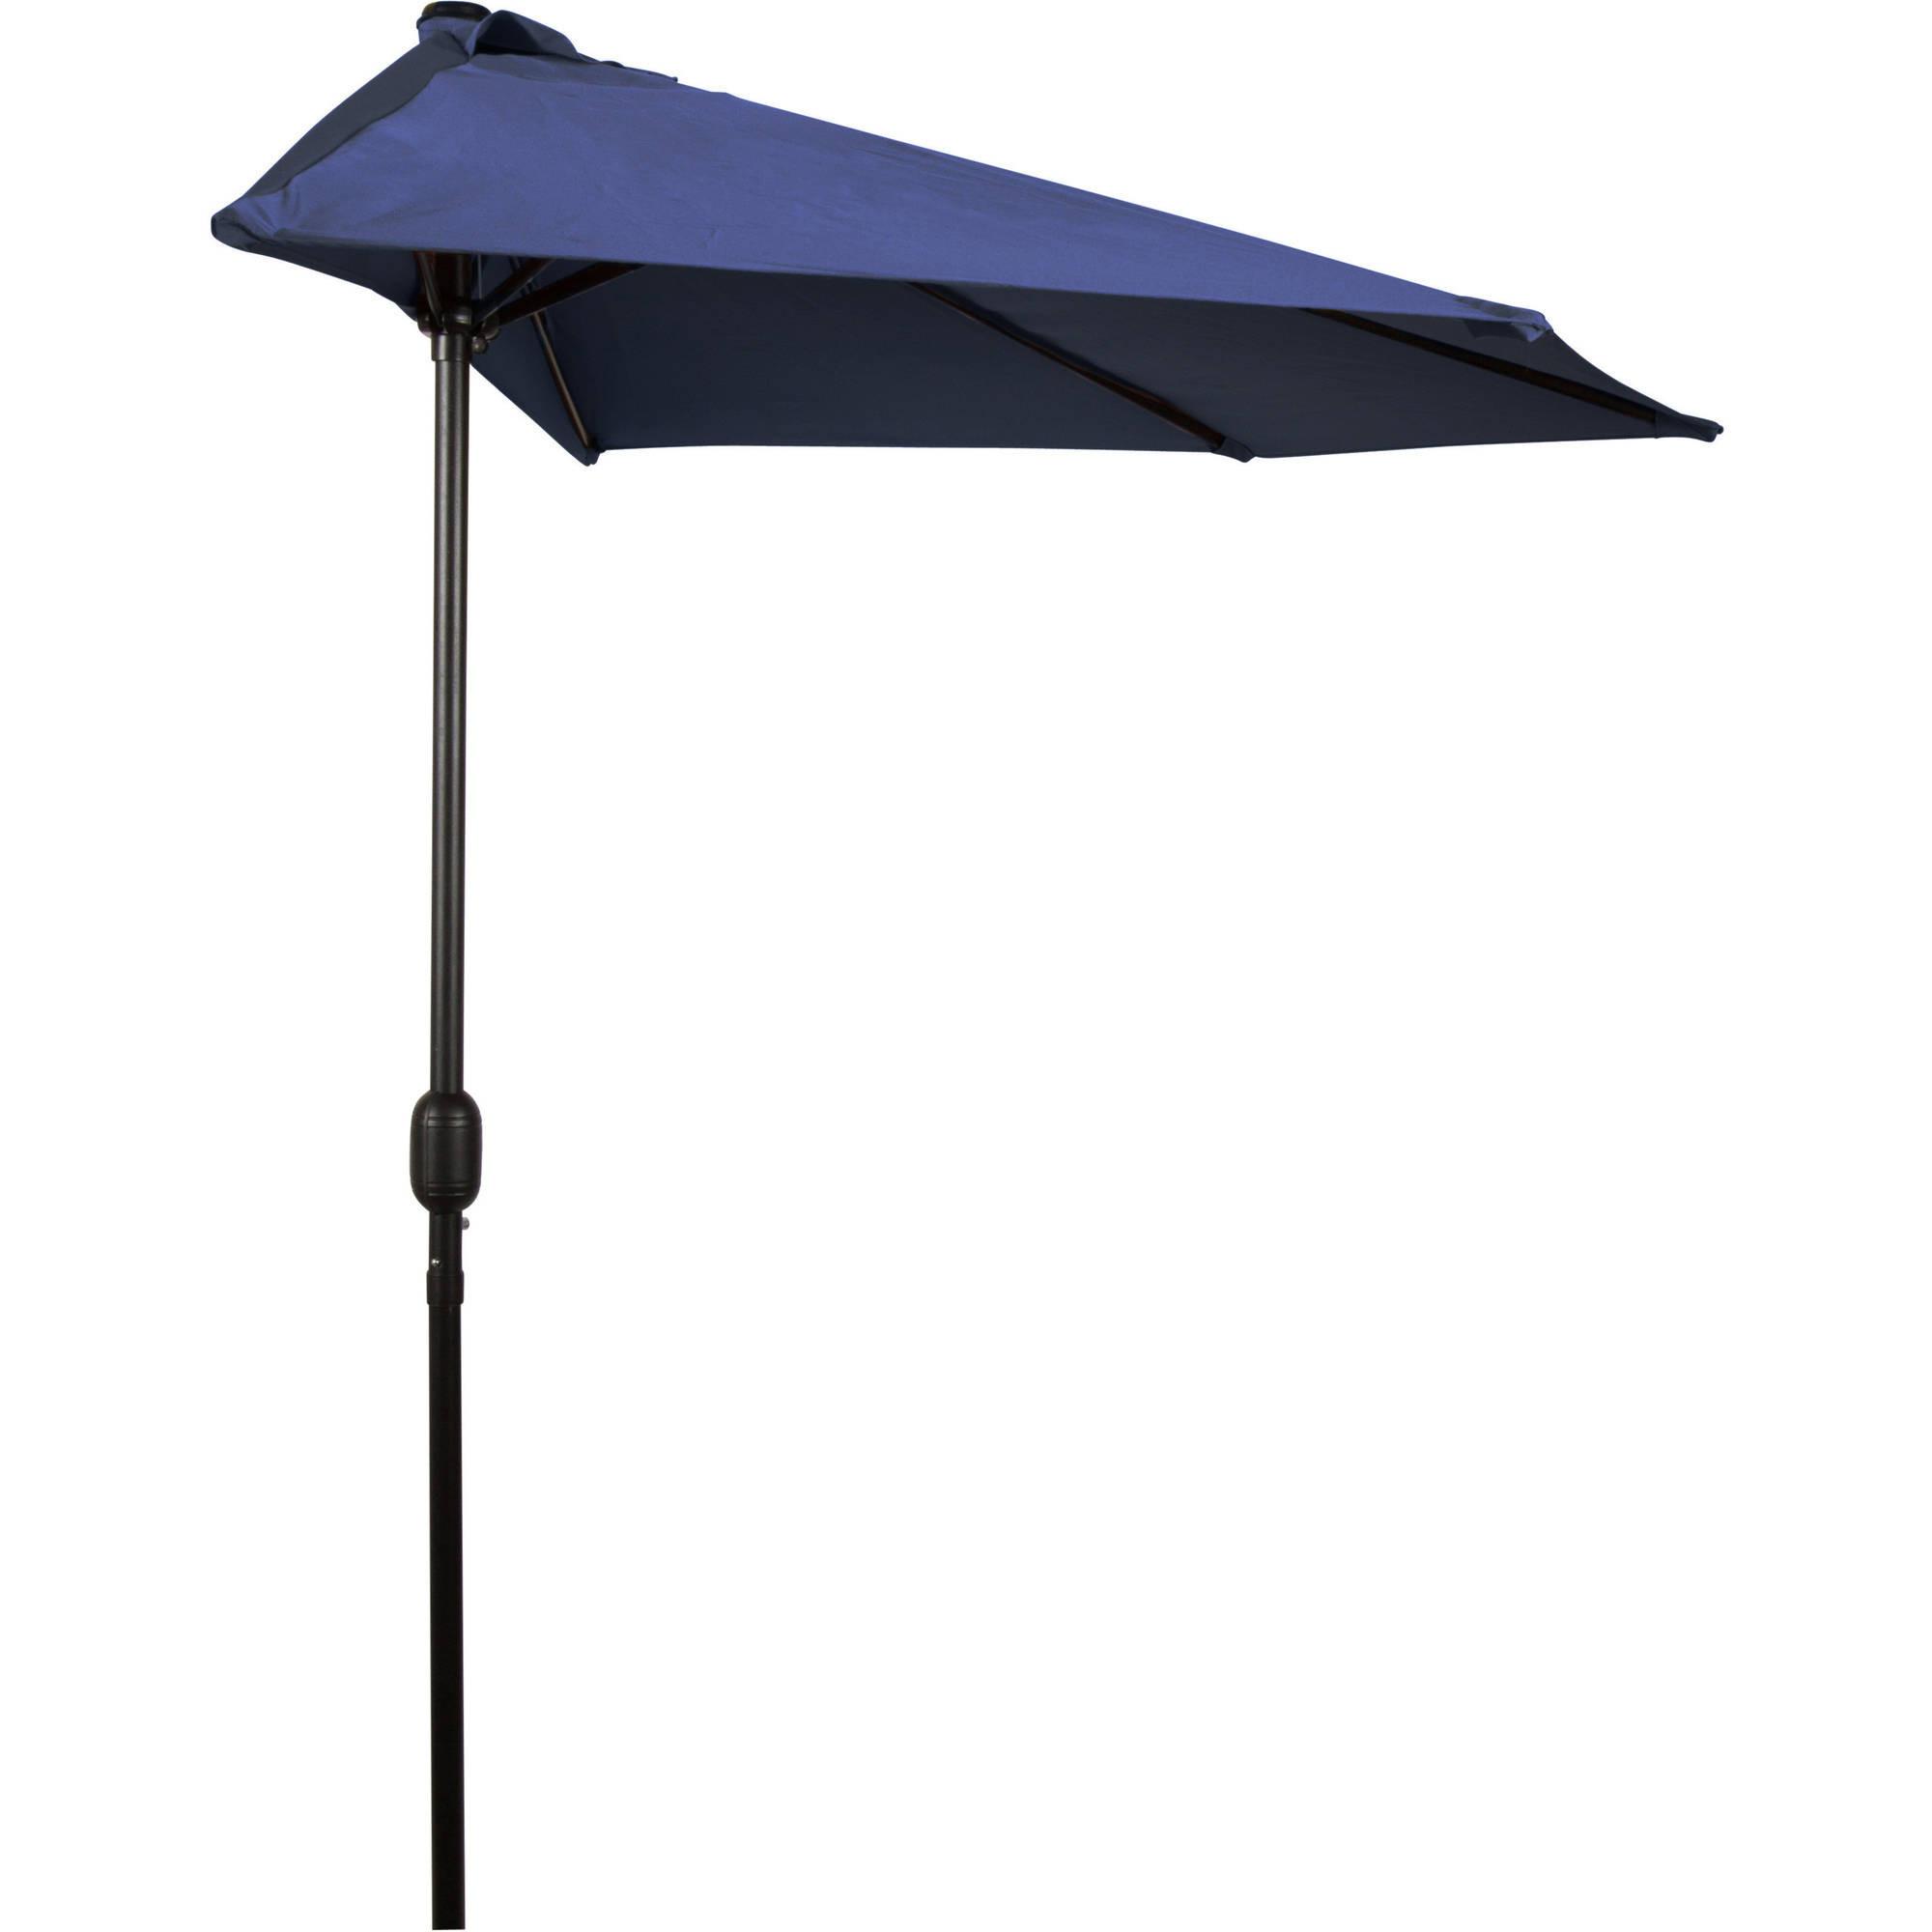 Best ideas about Patio Umbrellas Walmart . Save or Pin Trademark Innovations Patio Umbrellas Walmart Now.